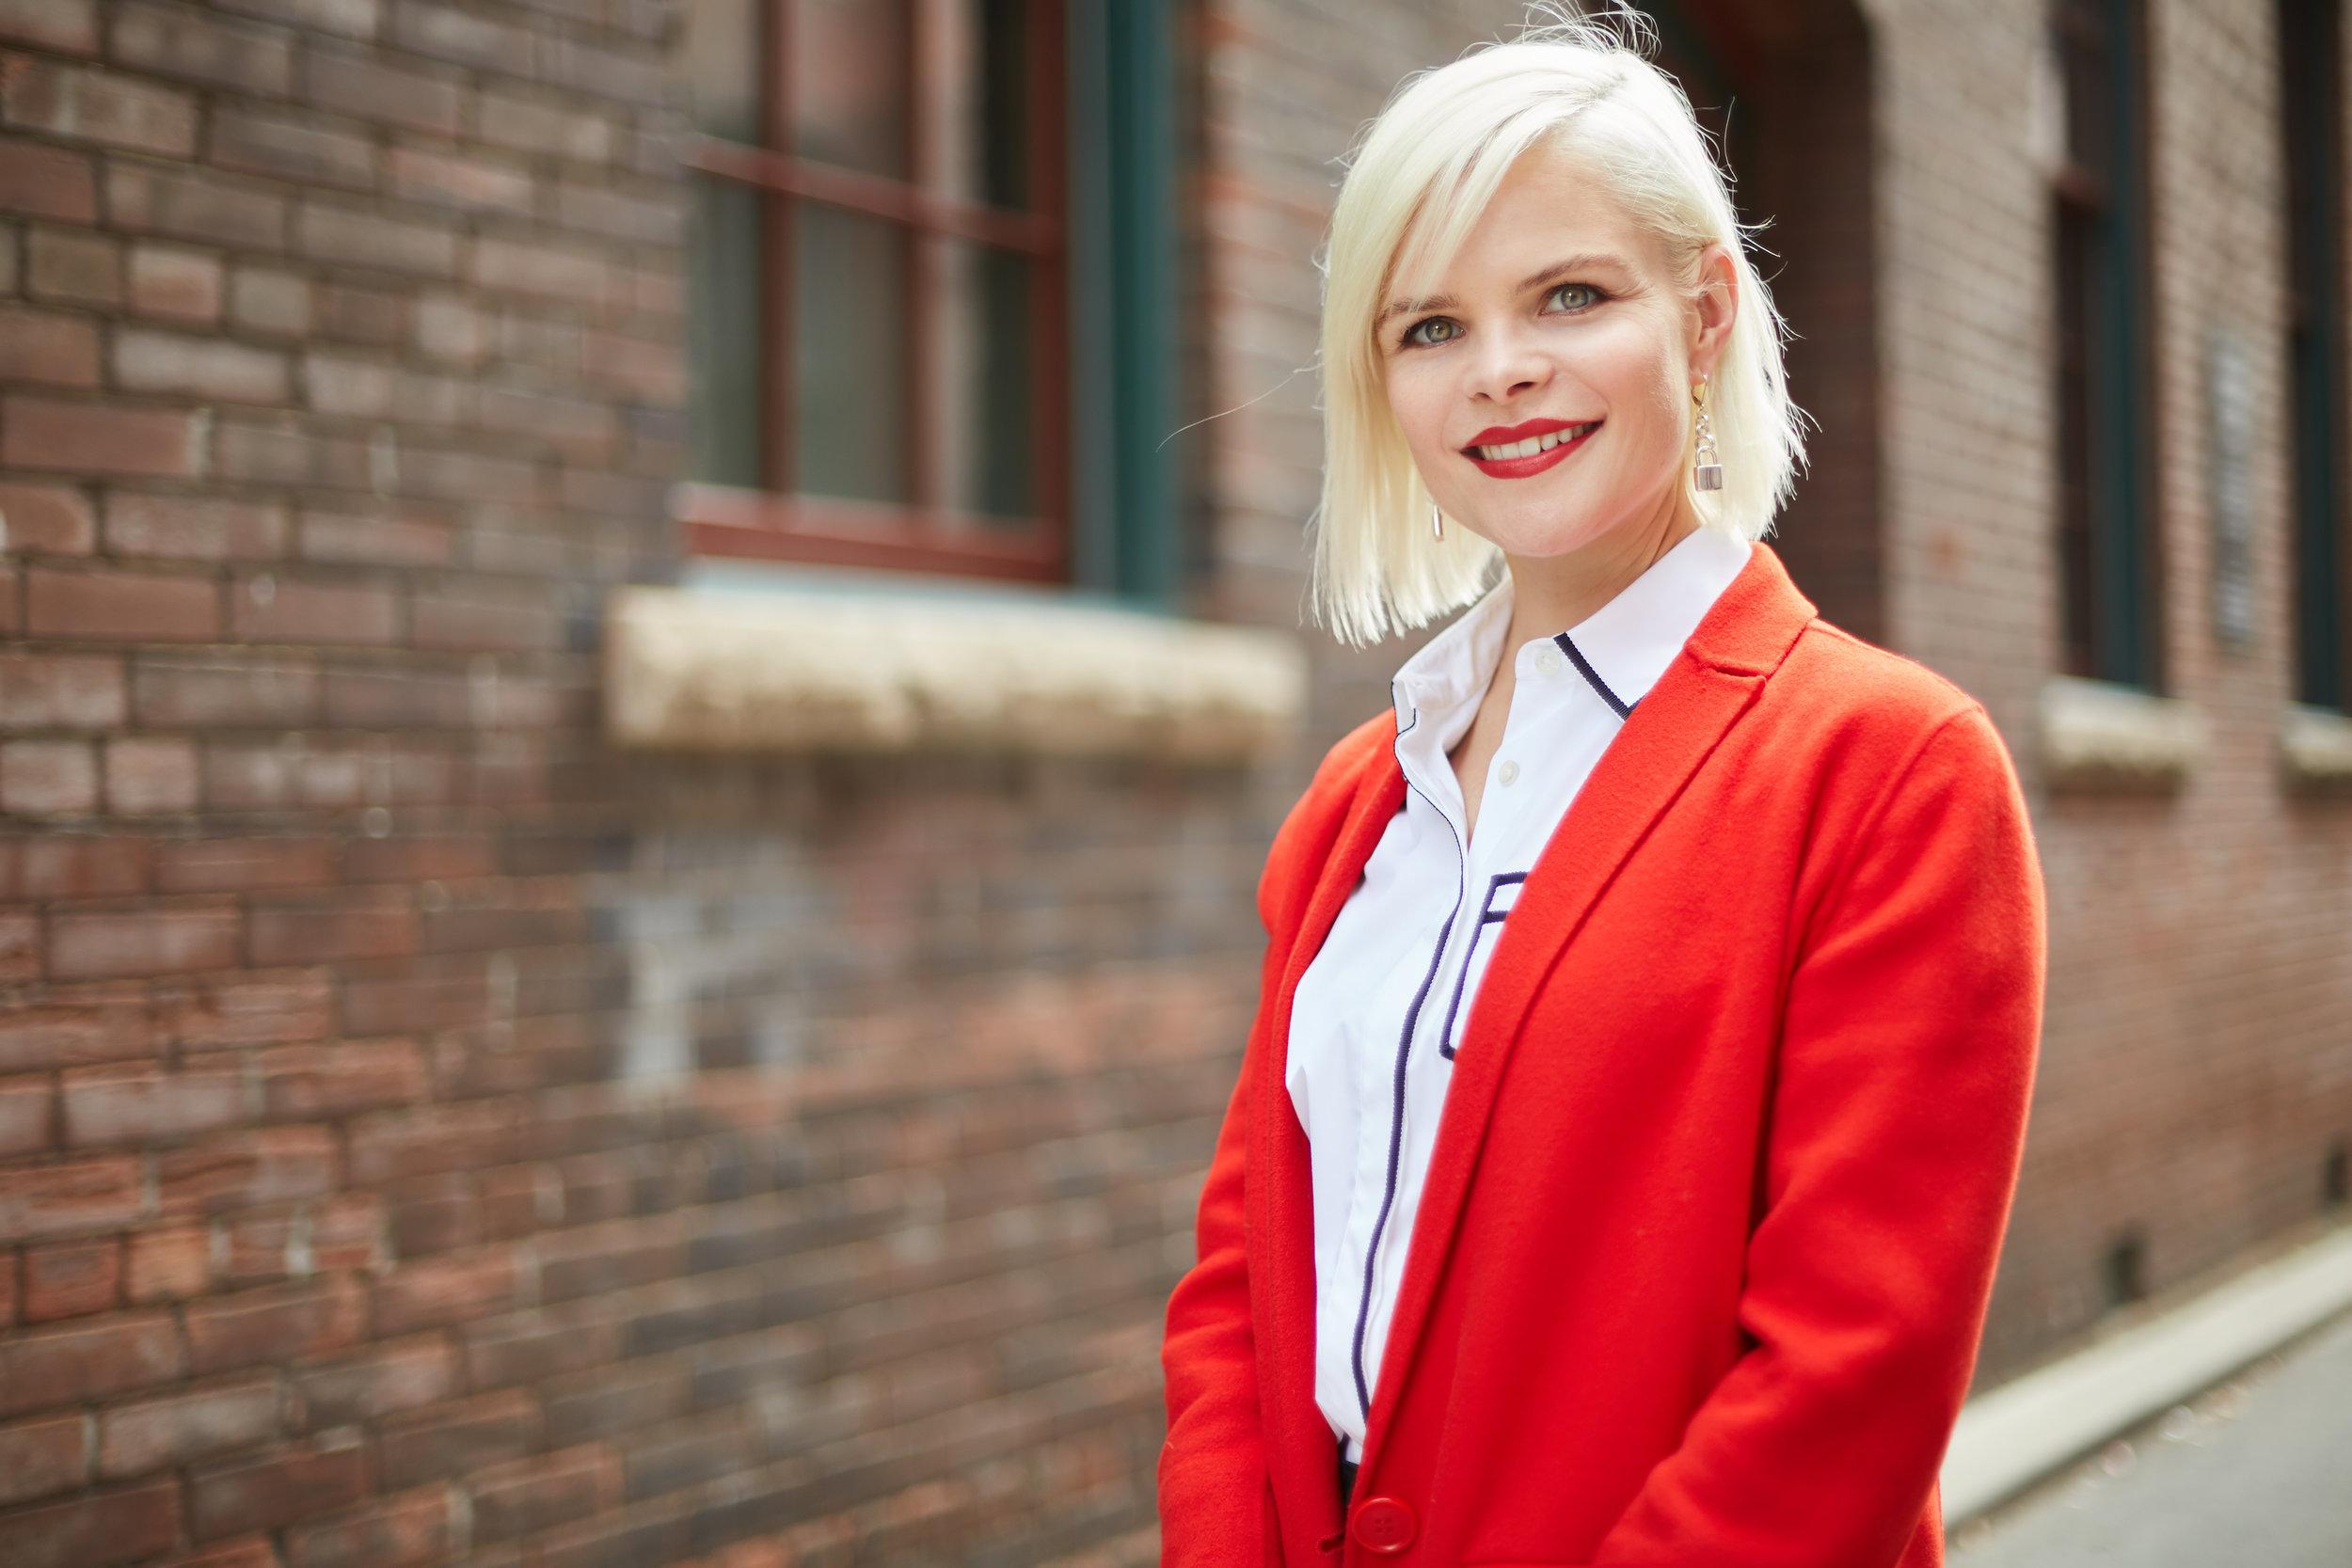 kirsten-schmidtke-young-professional-and-toronto-blogger.jpg